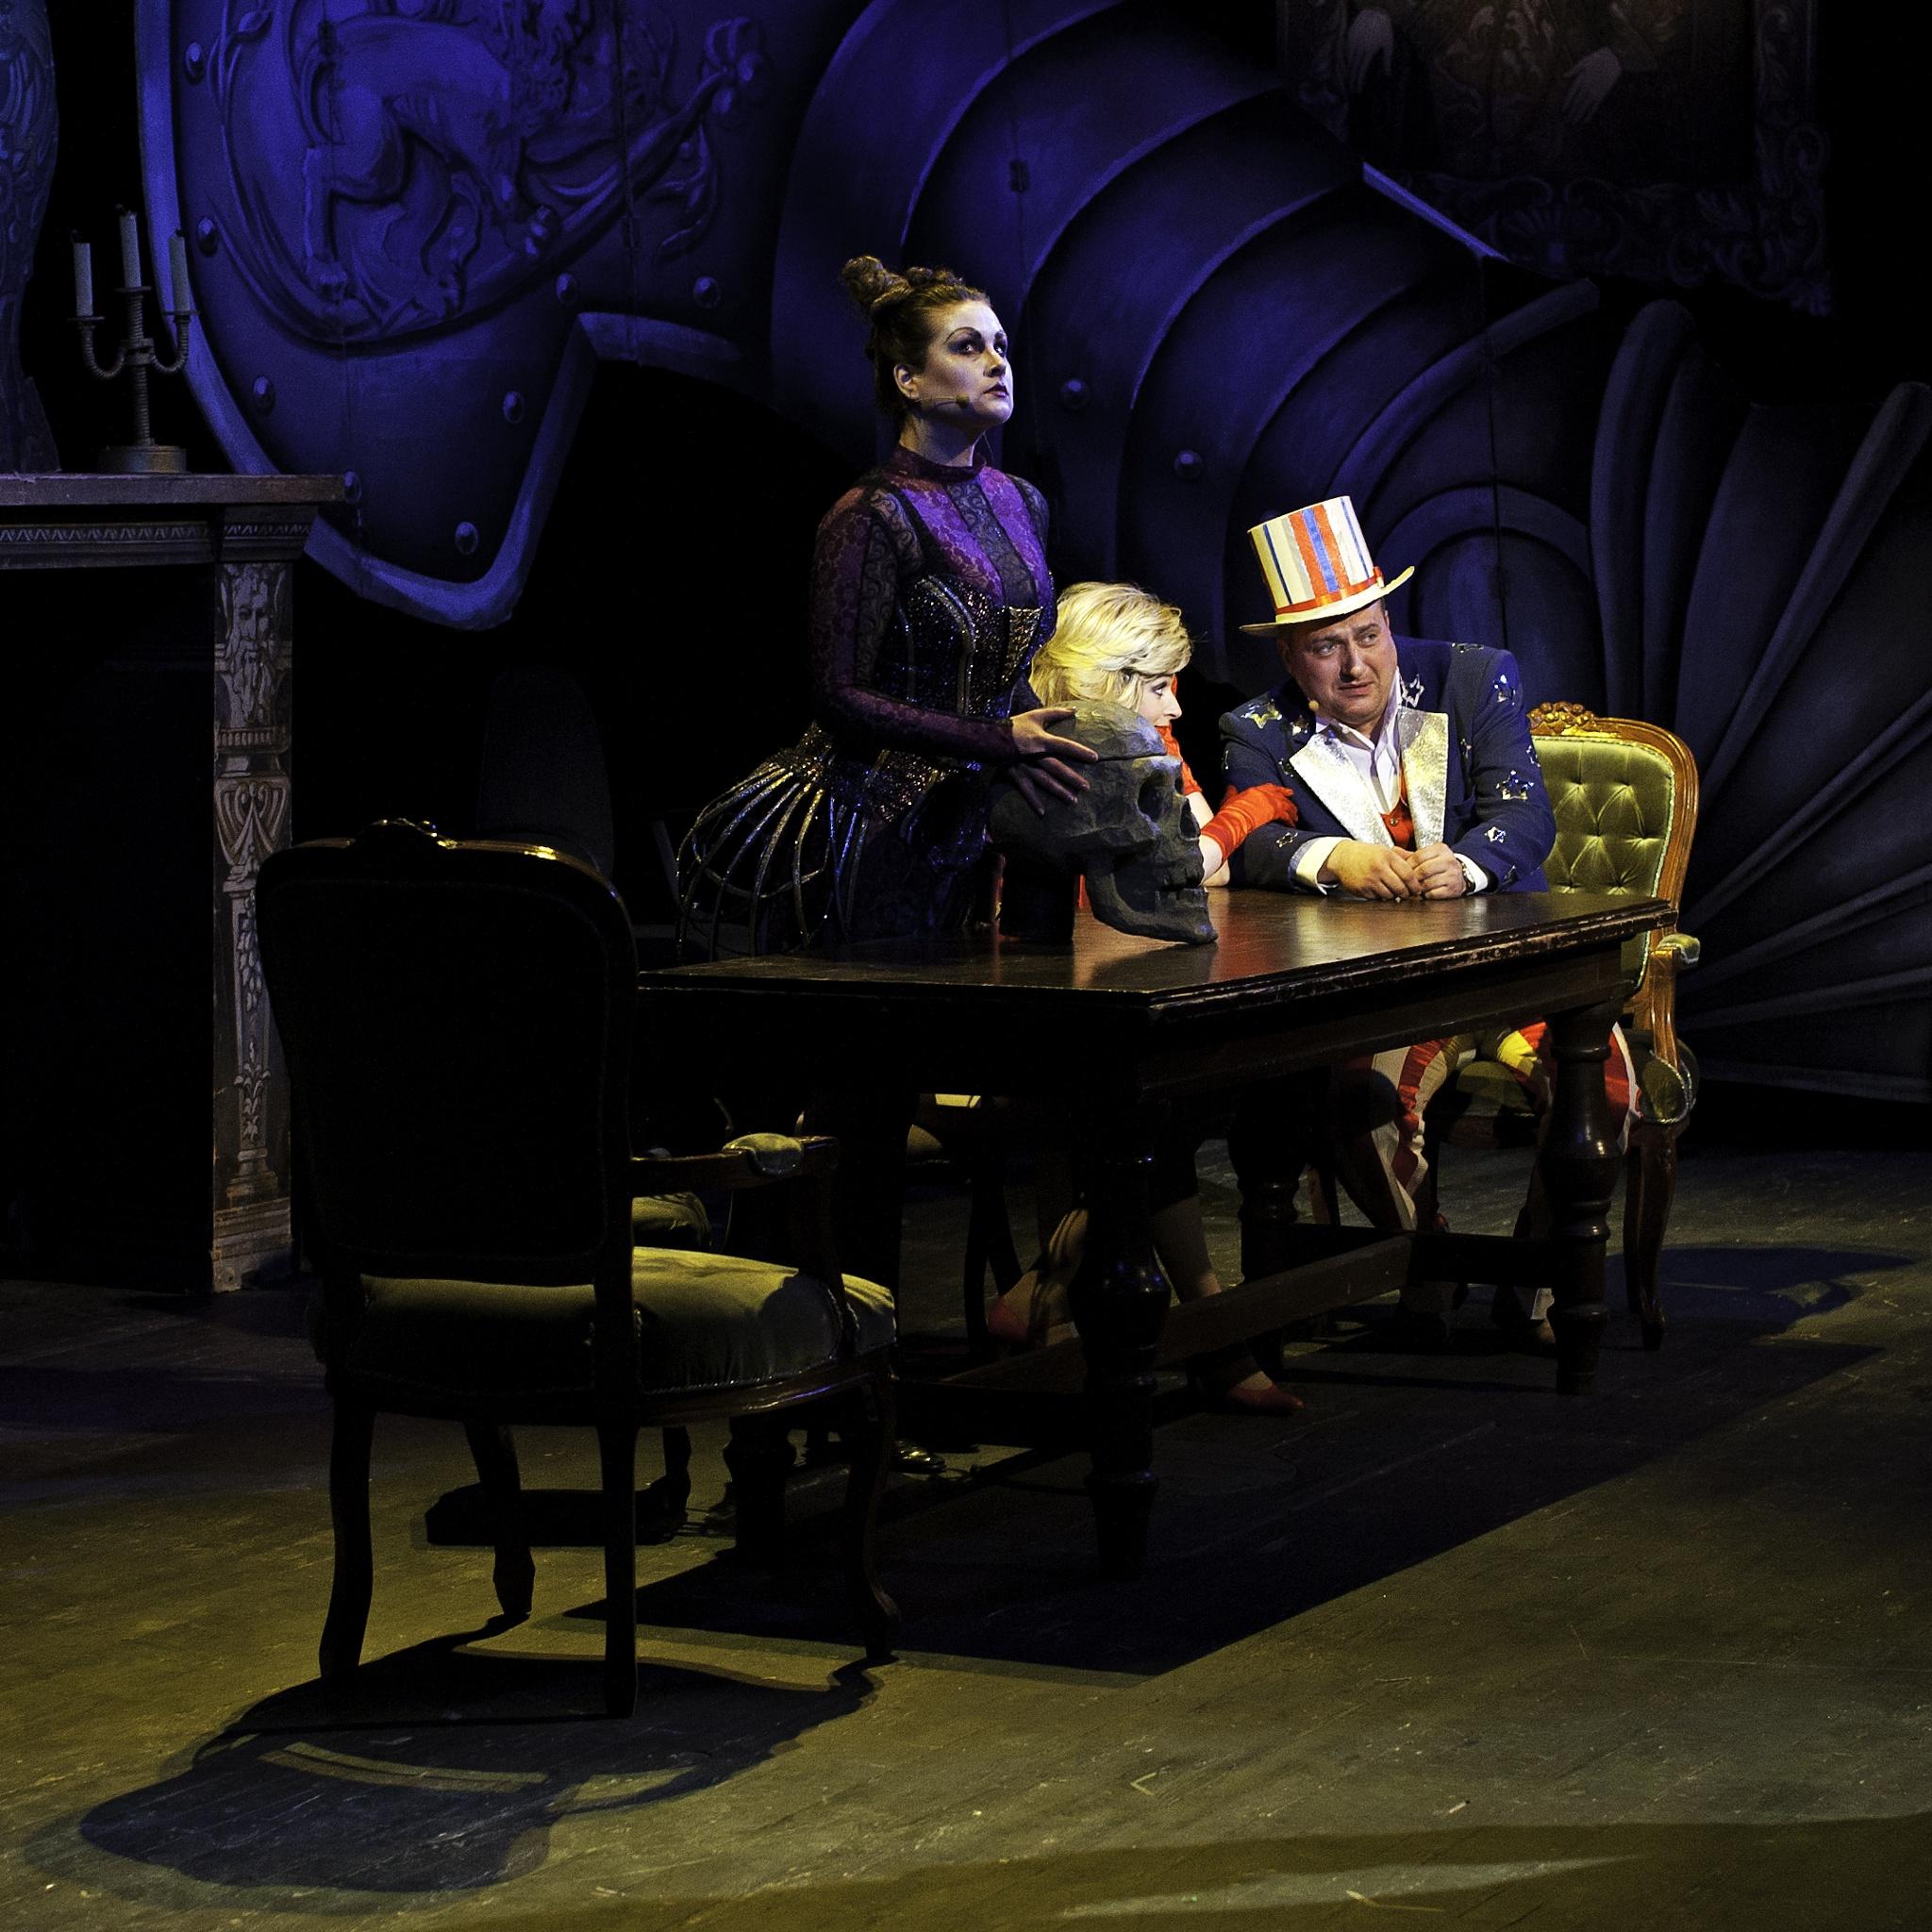 Theater backstage by Sasha Mirov